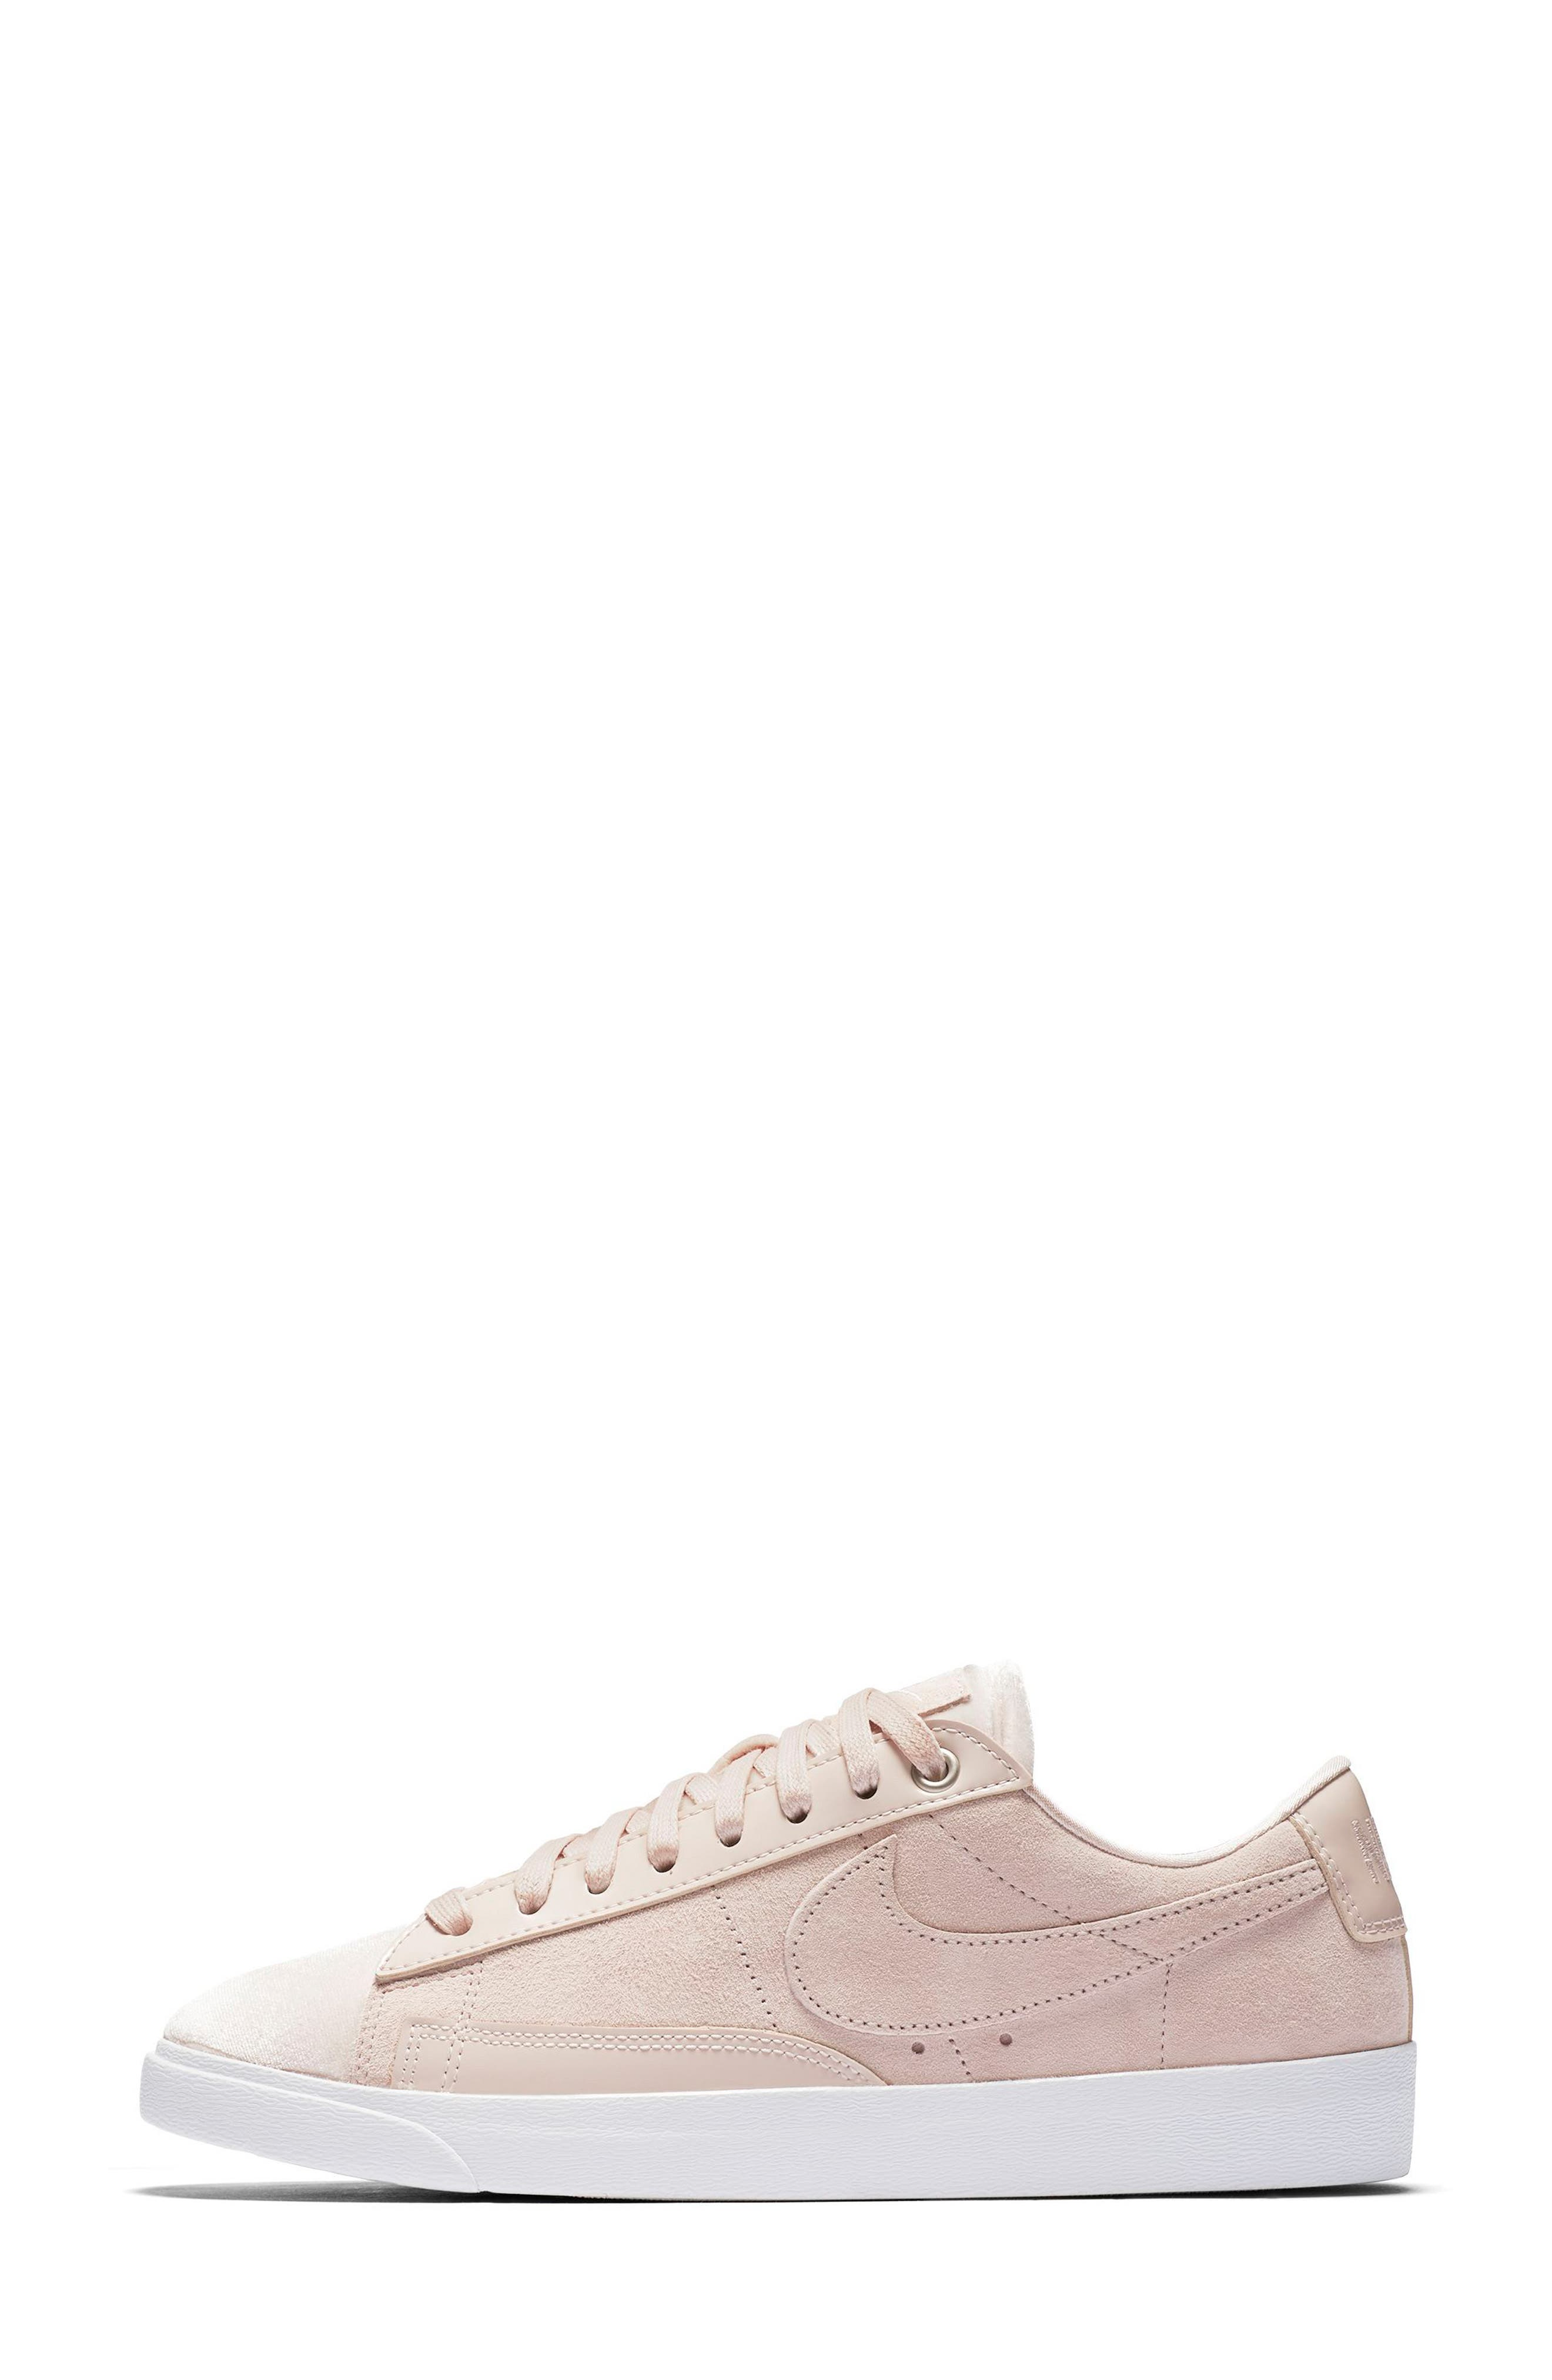 Blazer Low LX Sneaker,                             Alternate thumbnail 3, color,                             Silt Red/ Brown/ White